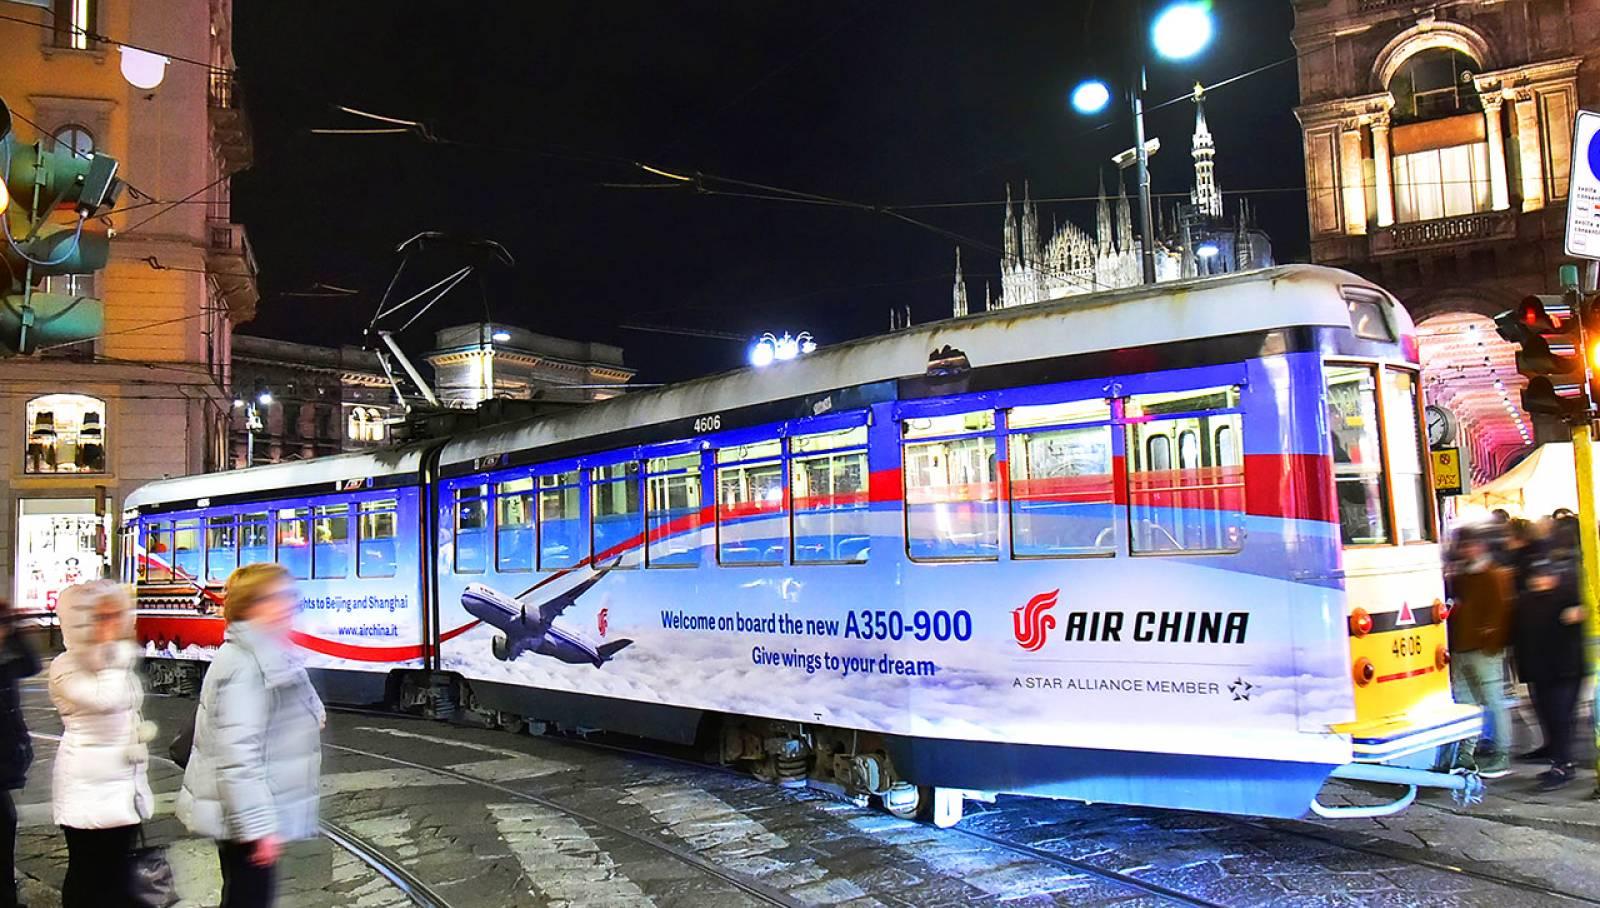 Pubblicità sui tram Milano IGPDecaux tram decorato per Air China